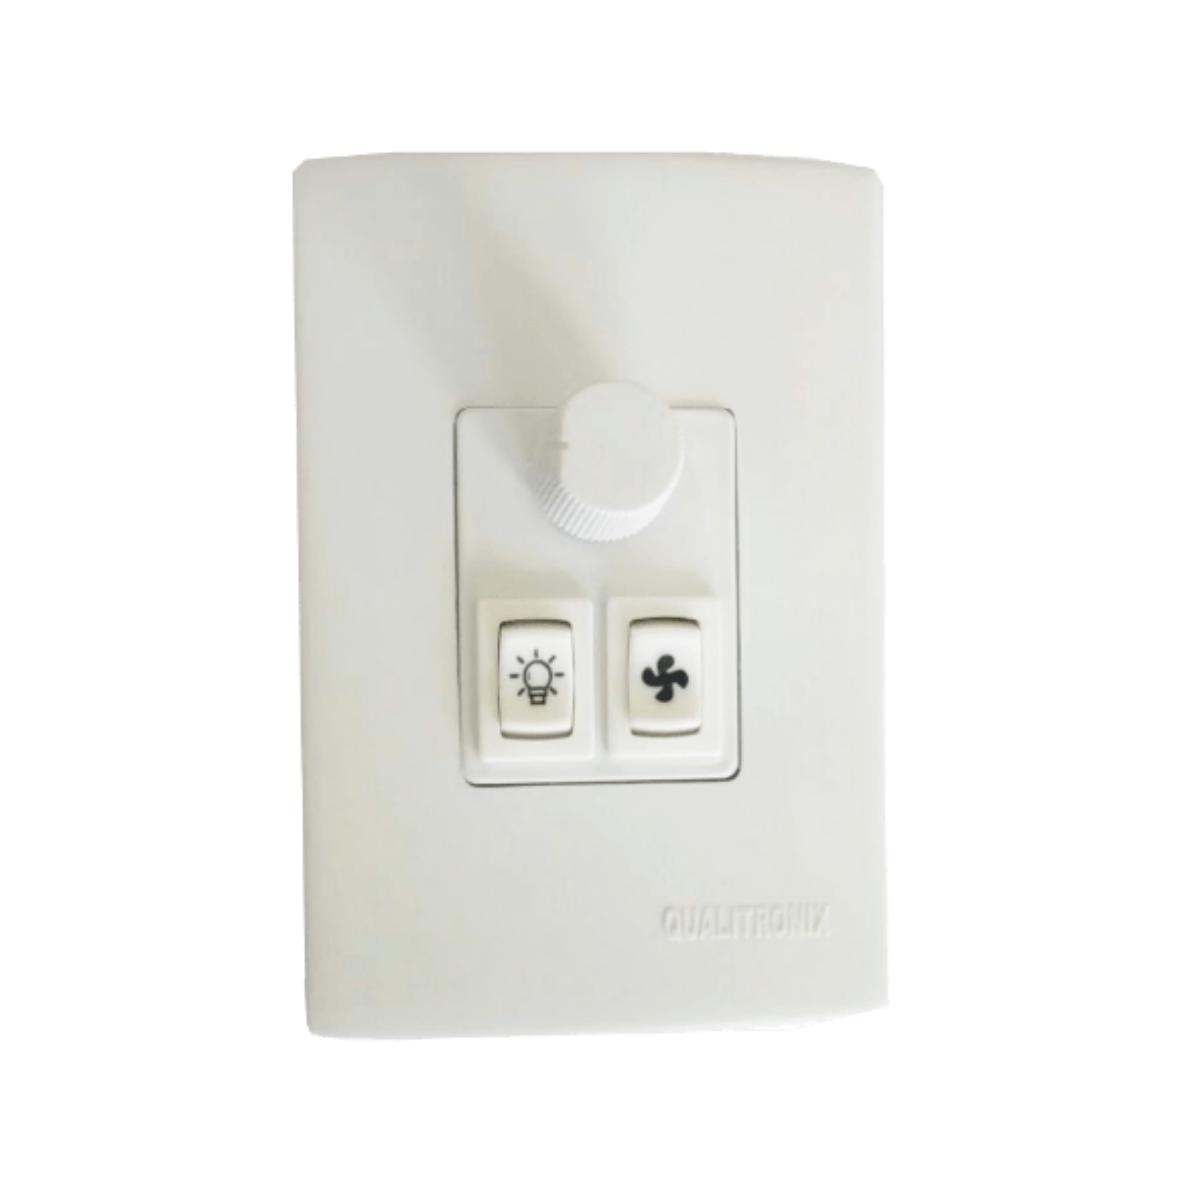 CONTROLE PARA VENTILADORE LAMPADA127/220V QUALITRONIX BRANCO - Qv371  - Districomp Distribuidora